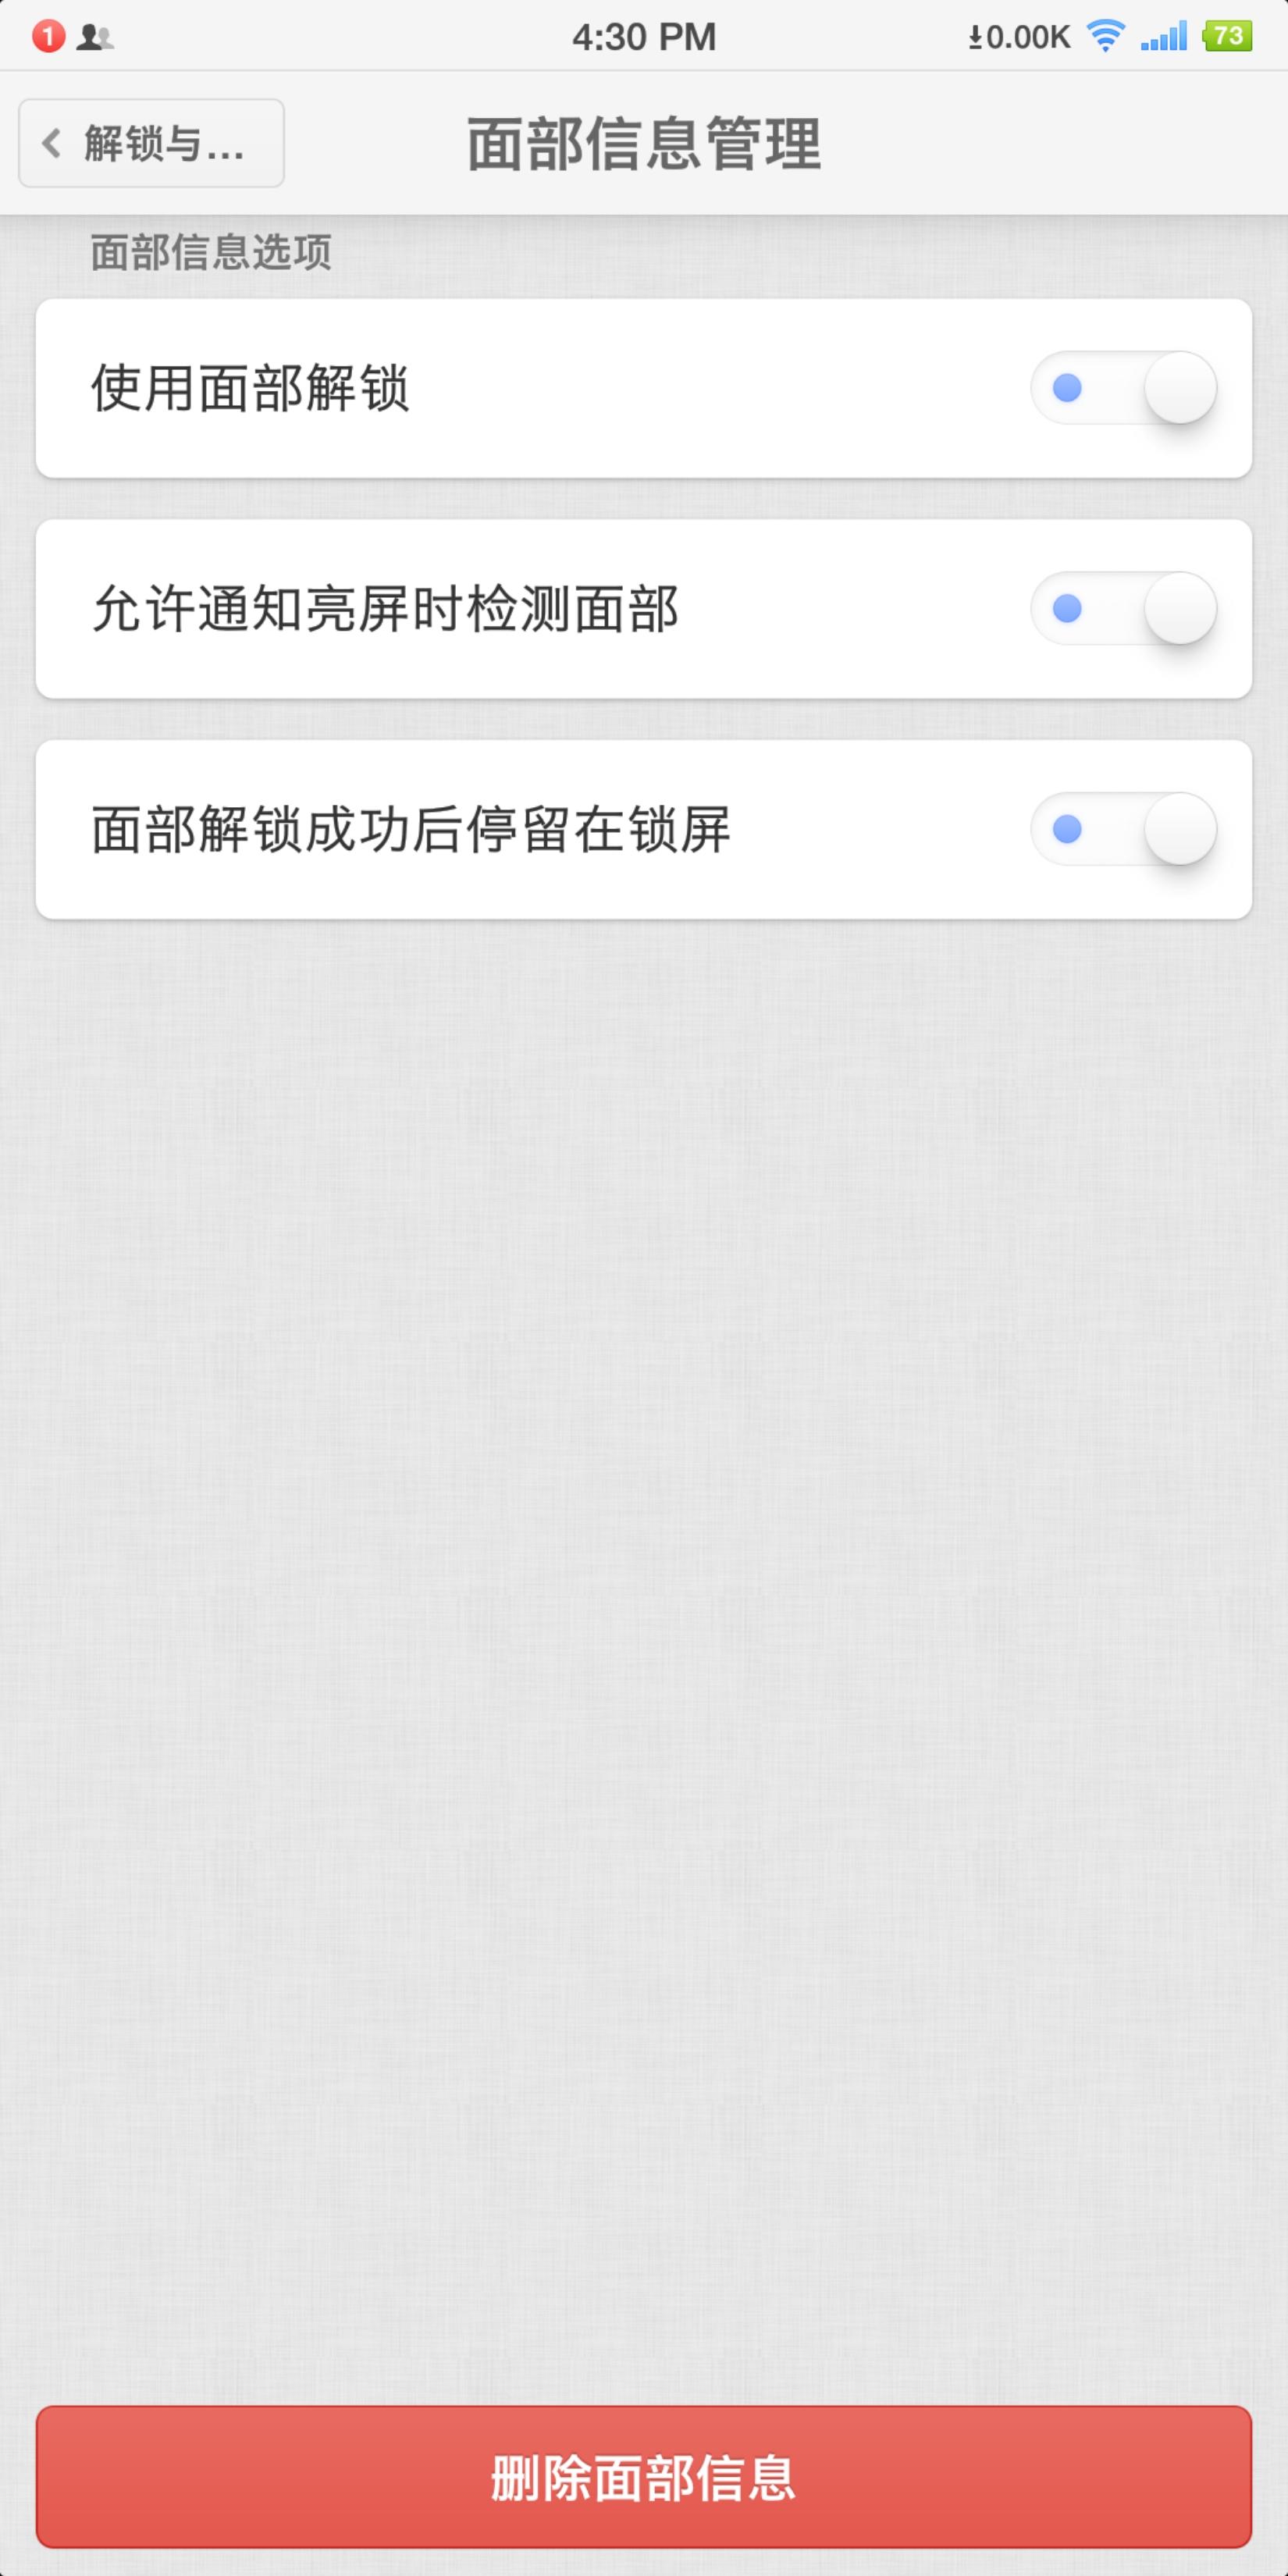 Screenshot_2018-08-21-16-30-24-713_??.png